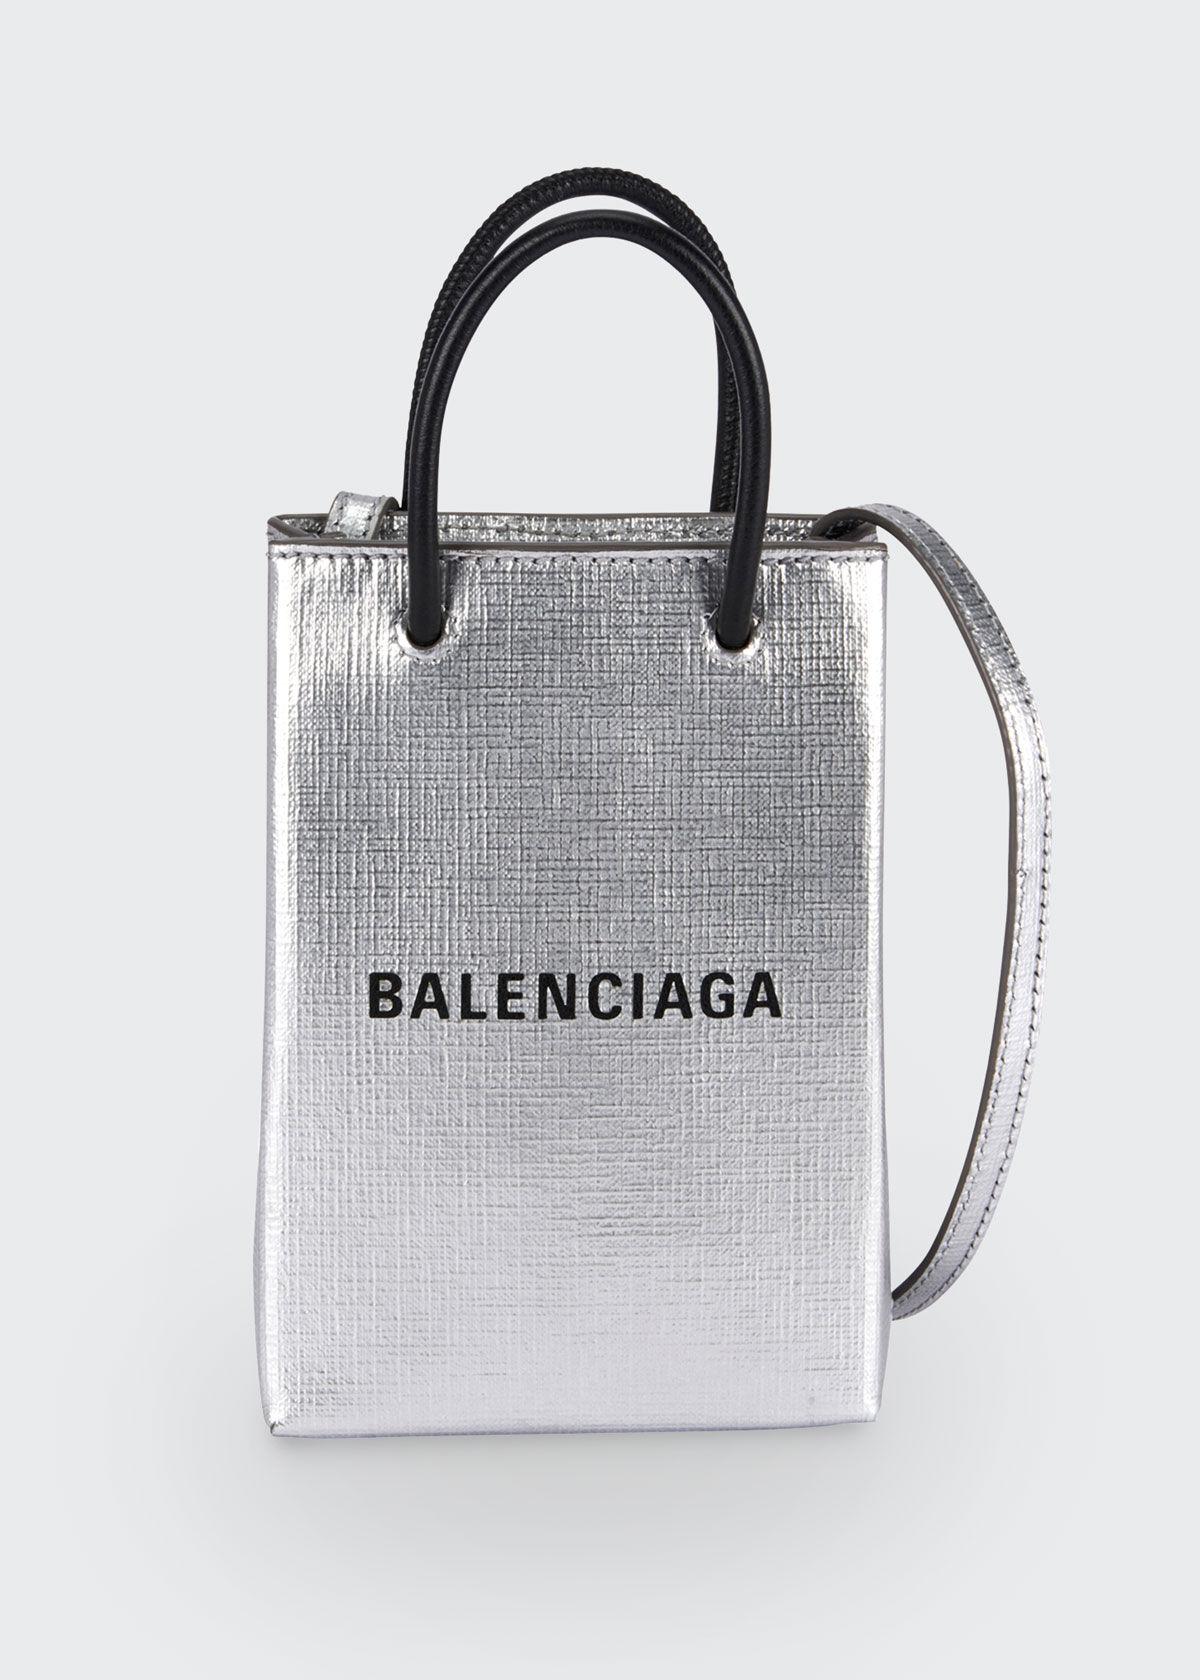 Balenciaga Shop Phone Holder Bag  - female - SILVER